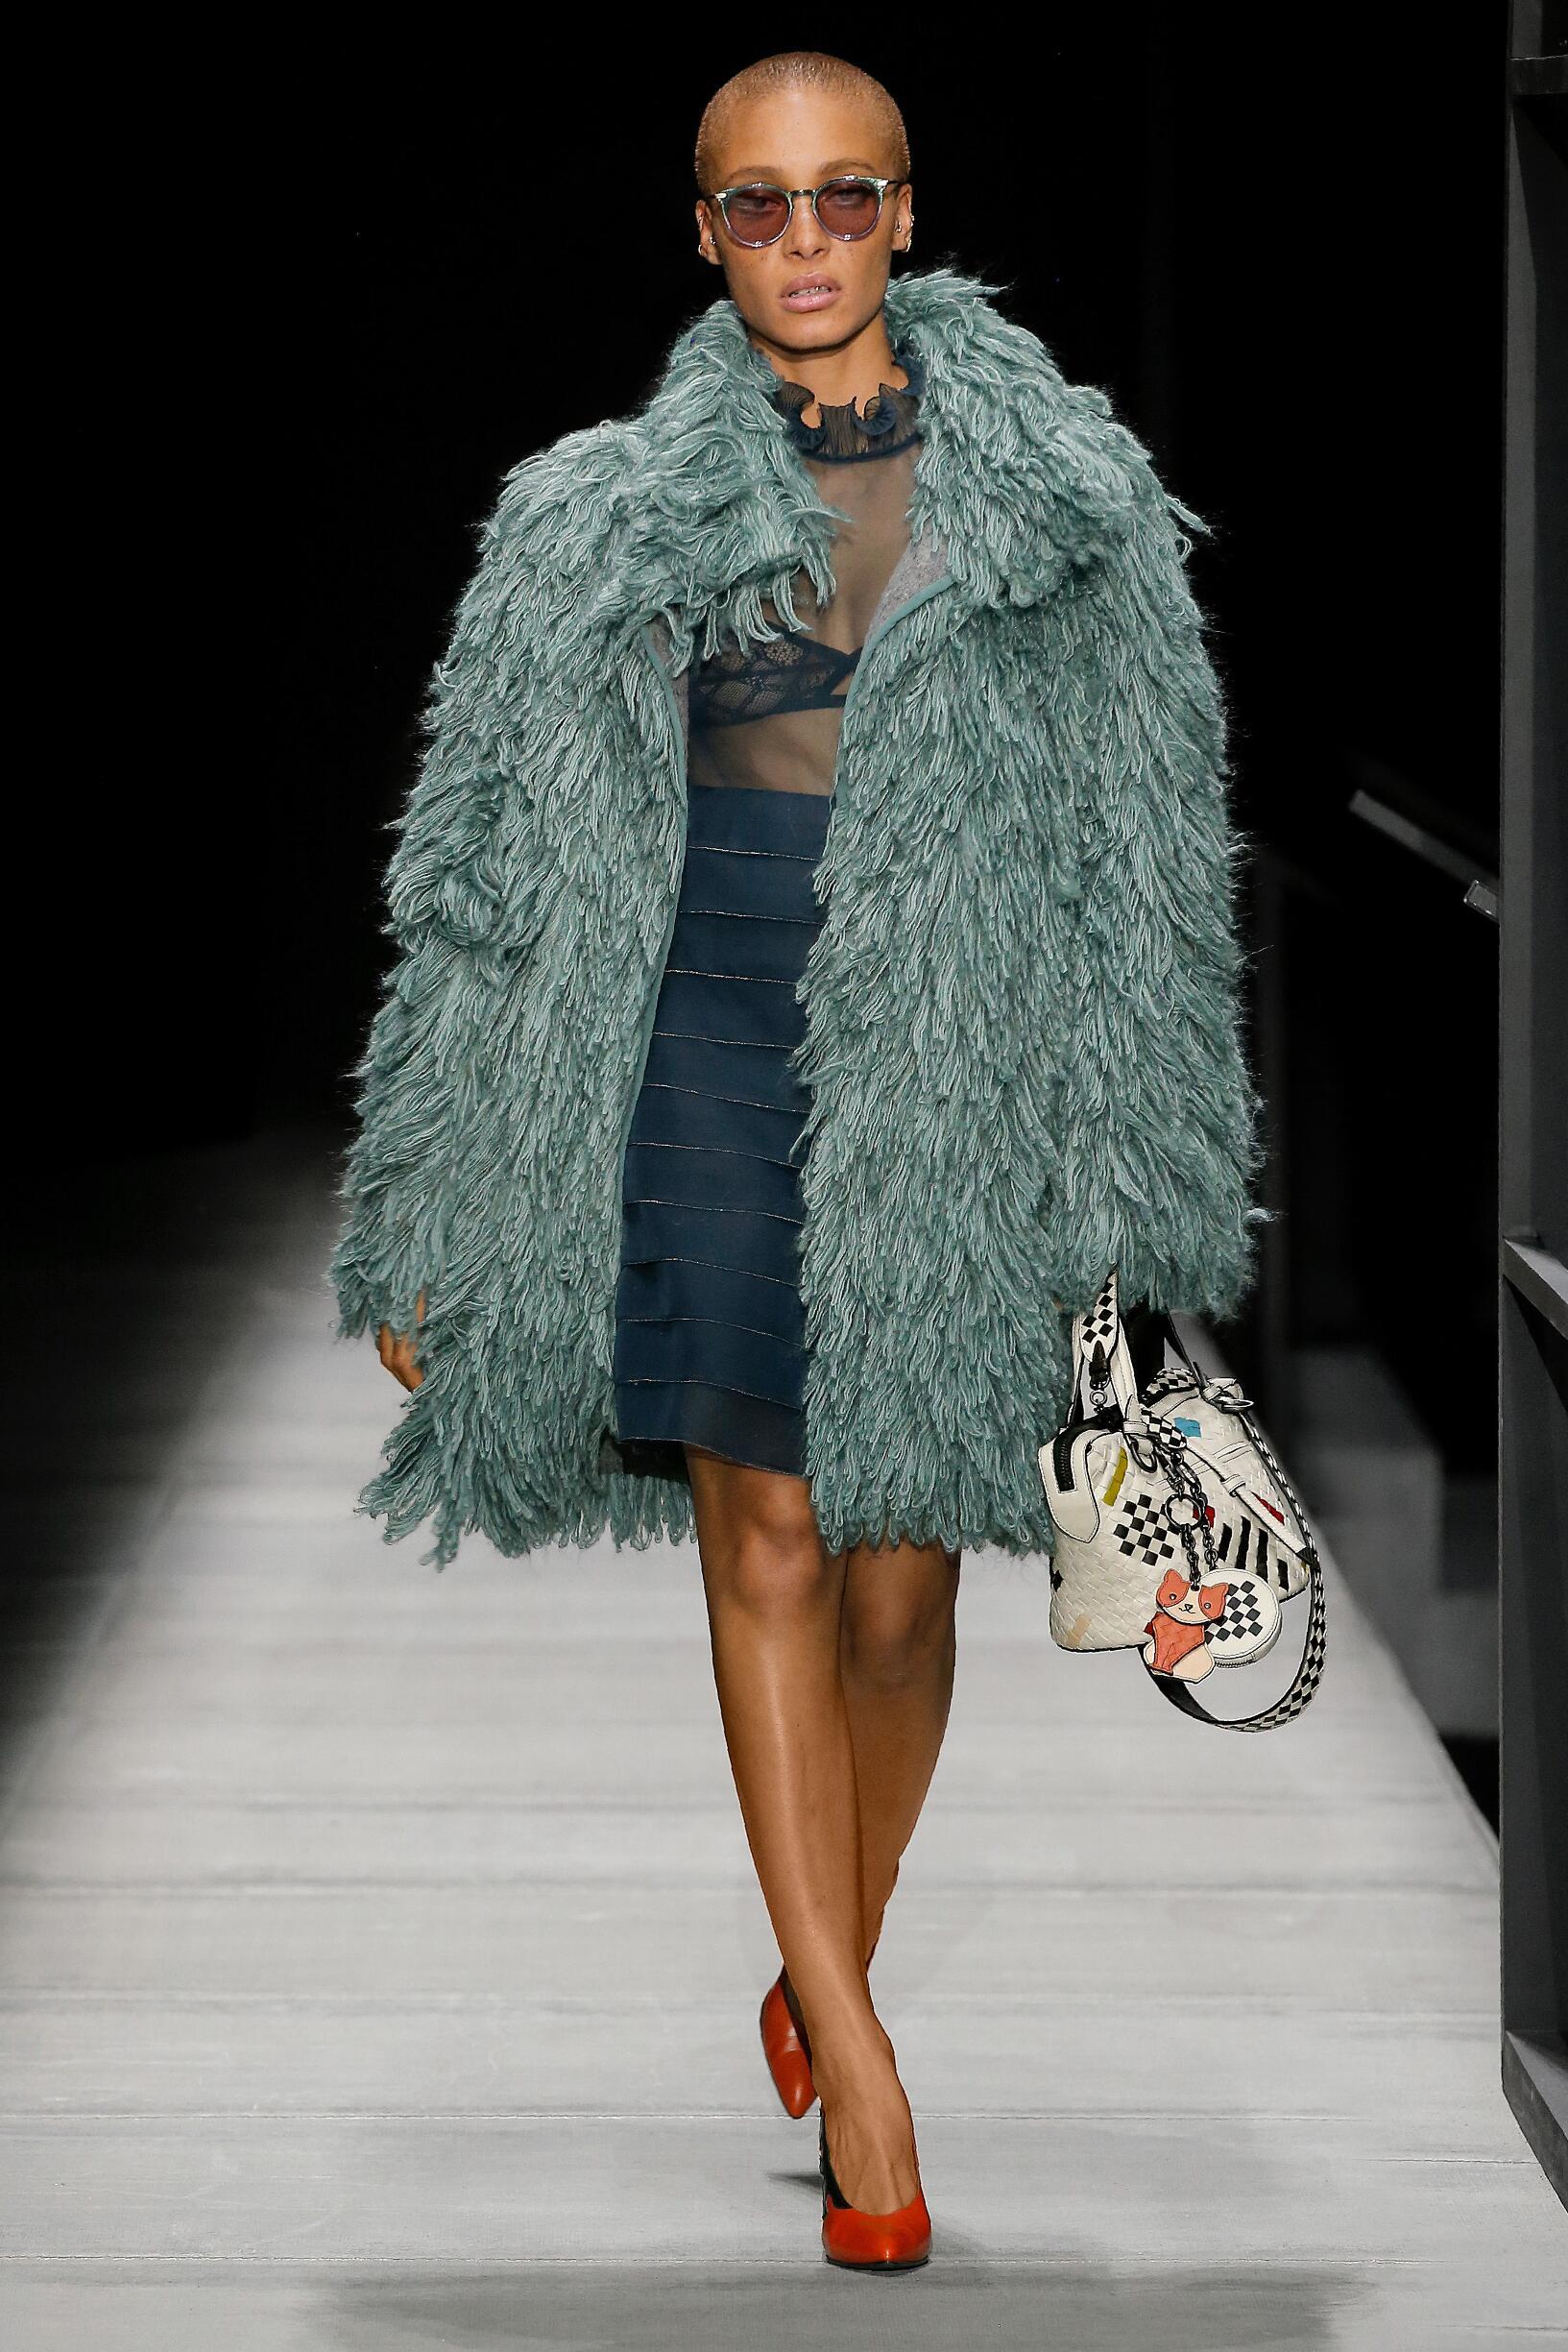 Catwalk Bottega Veneta Woman Fashion Show Winter 2018